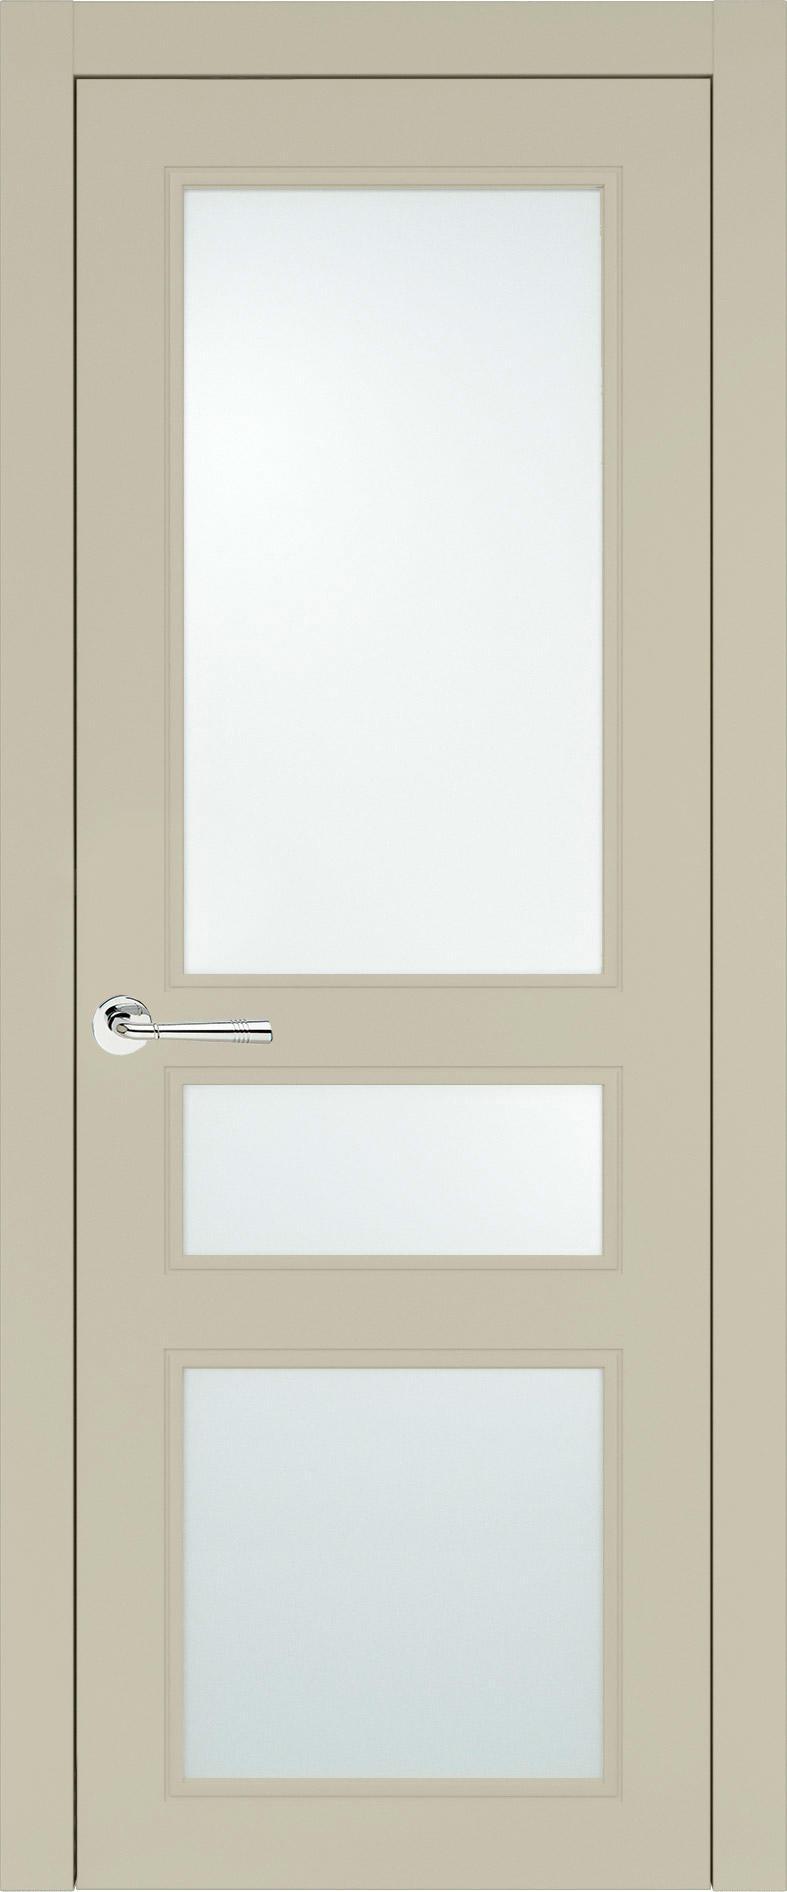 Imperia-R Neo Classic цвет - Серо-оливковая эмаль (RAL 7032) Со стеклом (ДО)